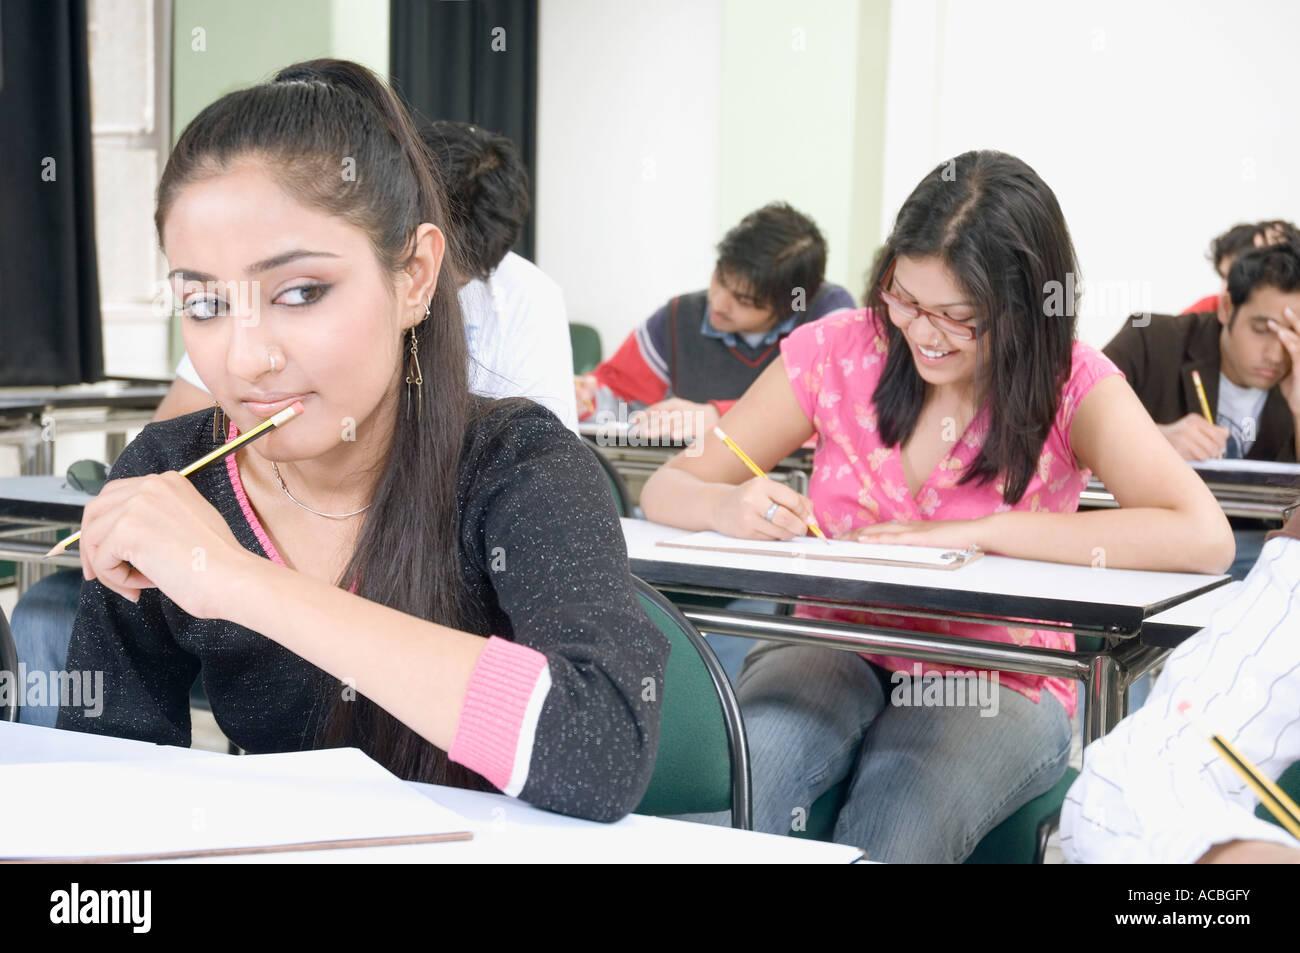 Exam Cheat Stock Photos & Exam Cheat Stock Images - Alamy